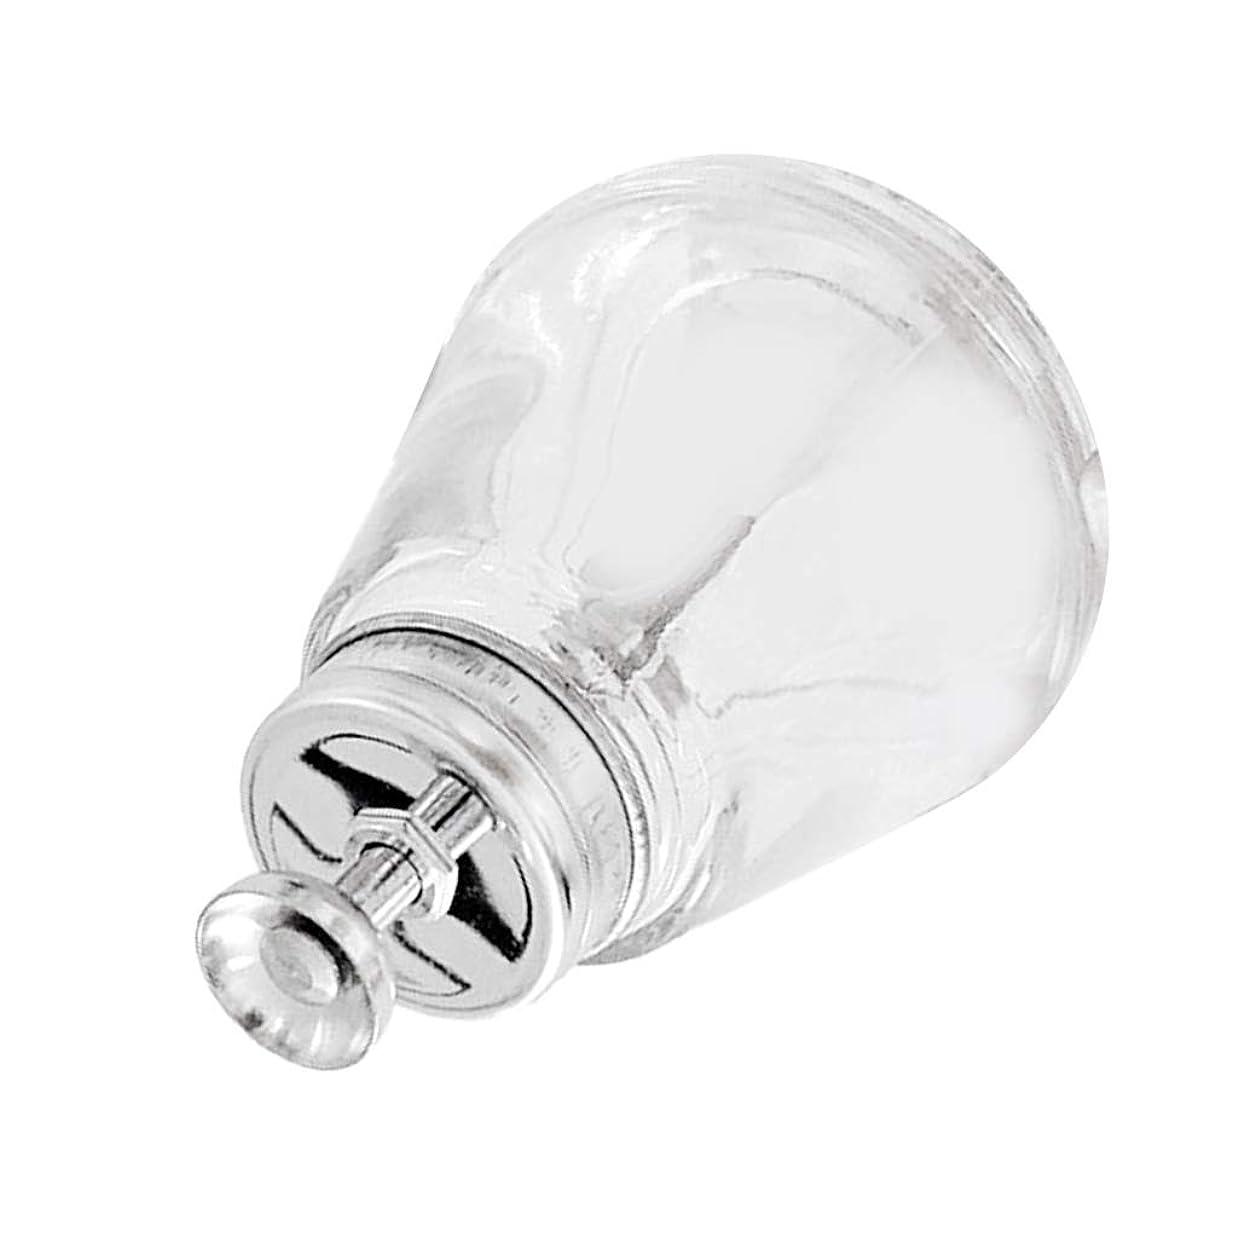 T TOOYFUL ネイルアートツールボトル ガラス瓶 150mL 蓋付き マニキュアリム用 ネイルケア 空ポンプボトル